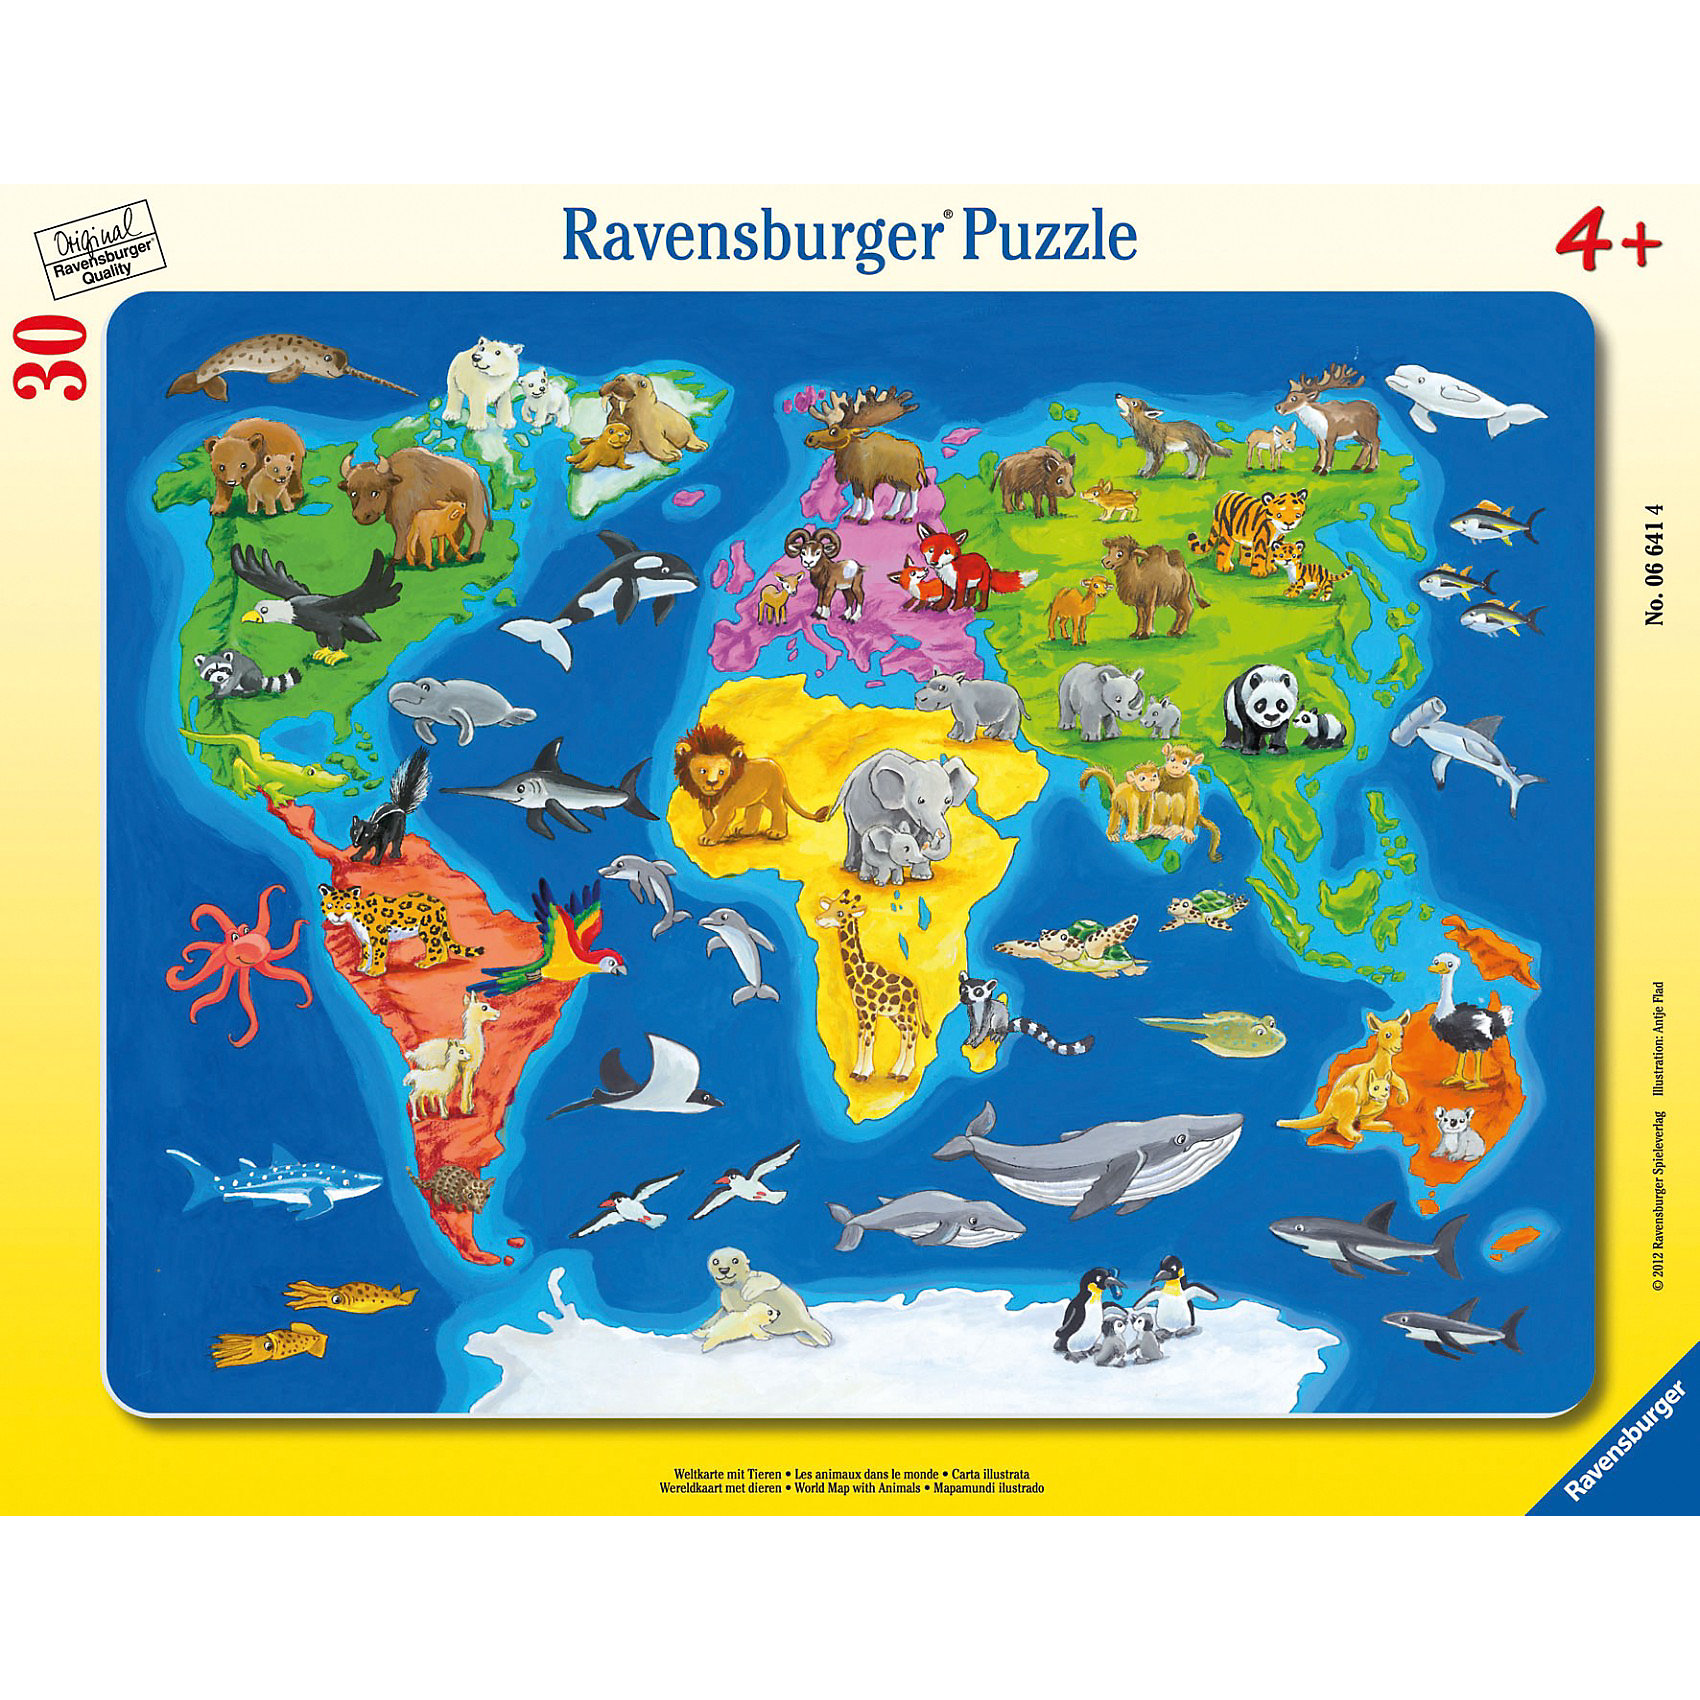 ���� ������ ���� � ���������, 30 �������, Ravensburger